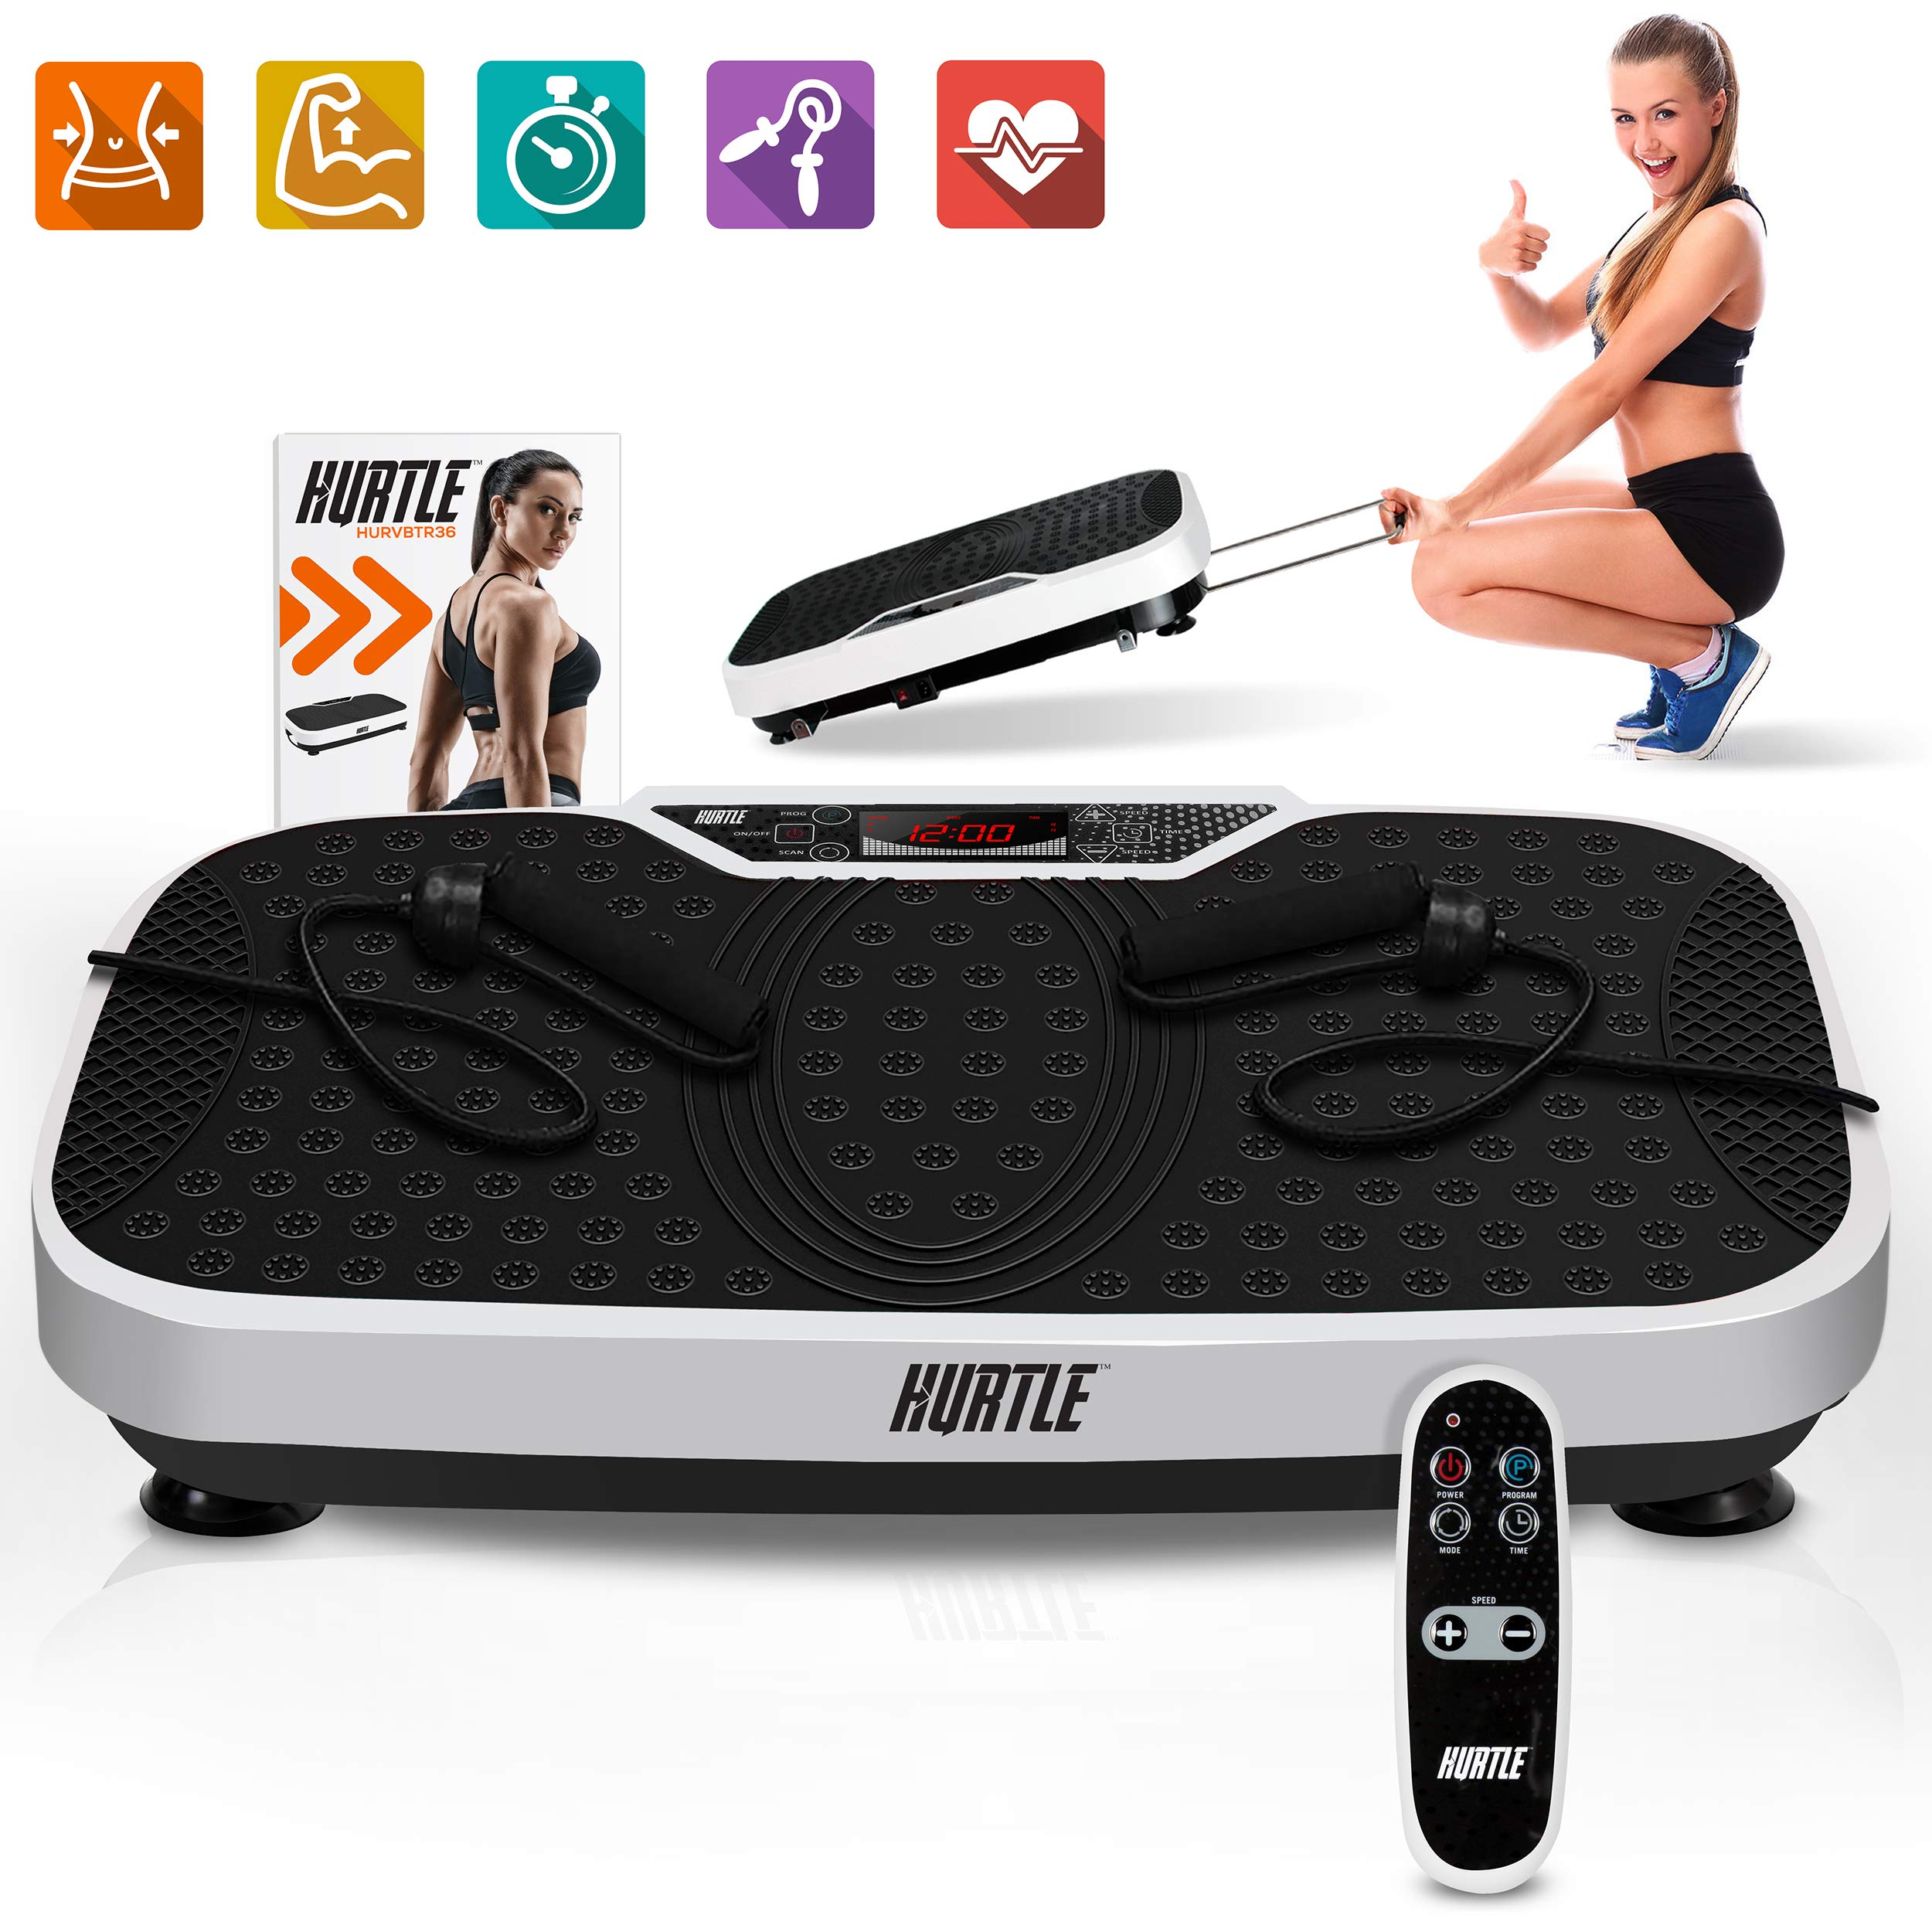 Hurtle Fitness Vibration Platform Machine